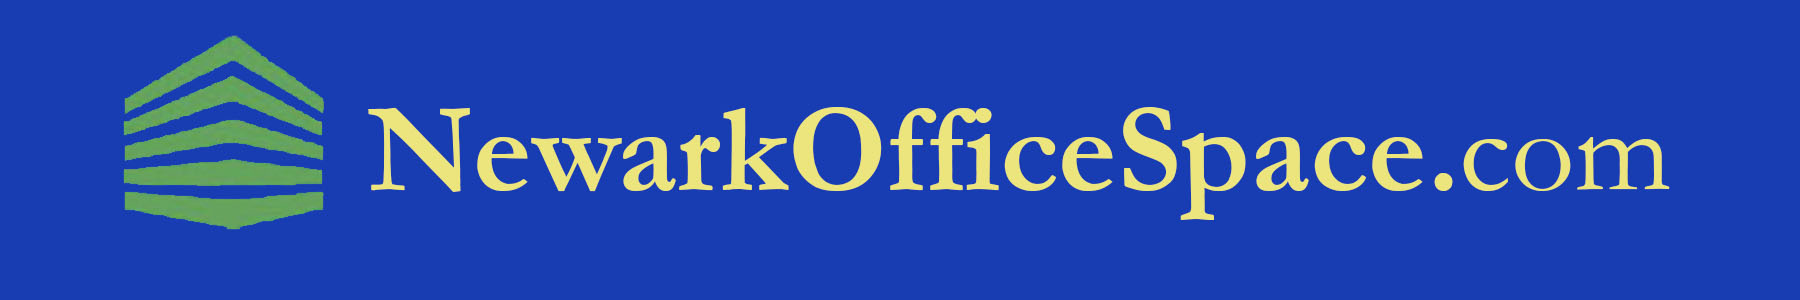 New NewarkOfficeSpace logo.jpg